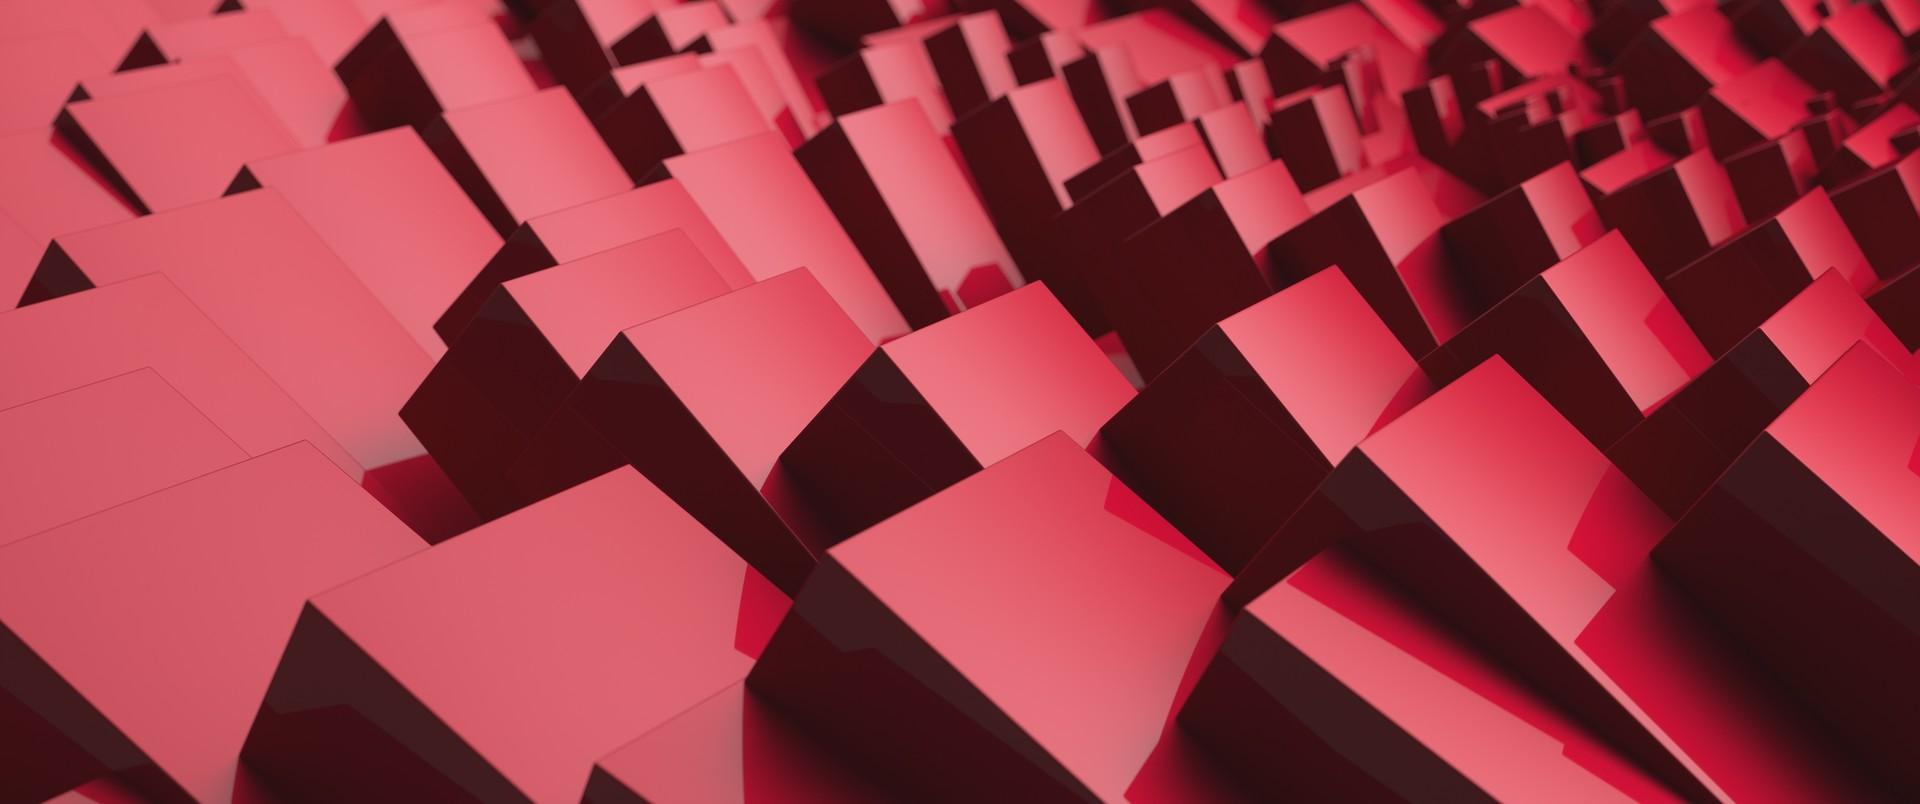 Kresimir jelusic robob3ar 494 abstract box 25 6k